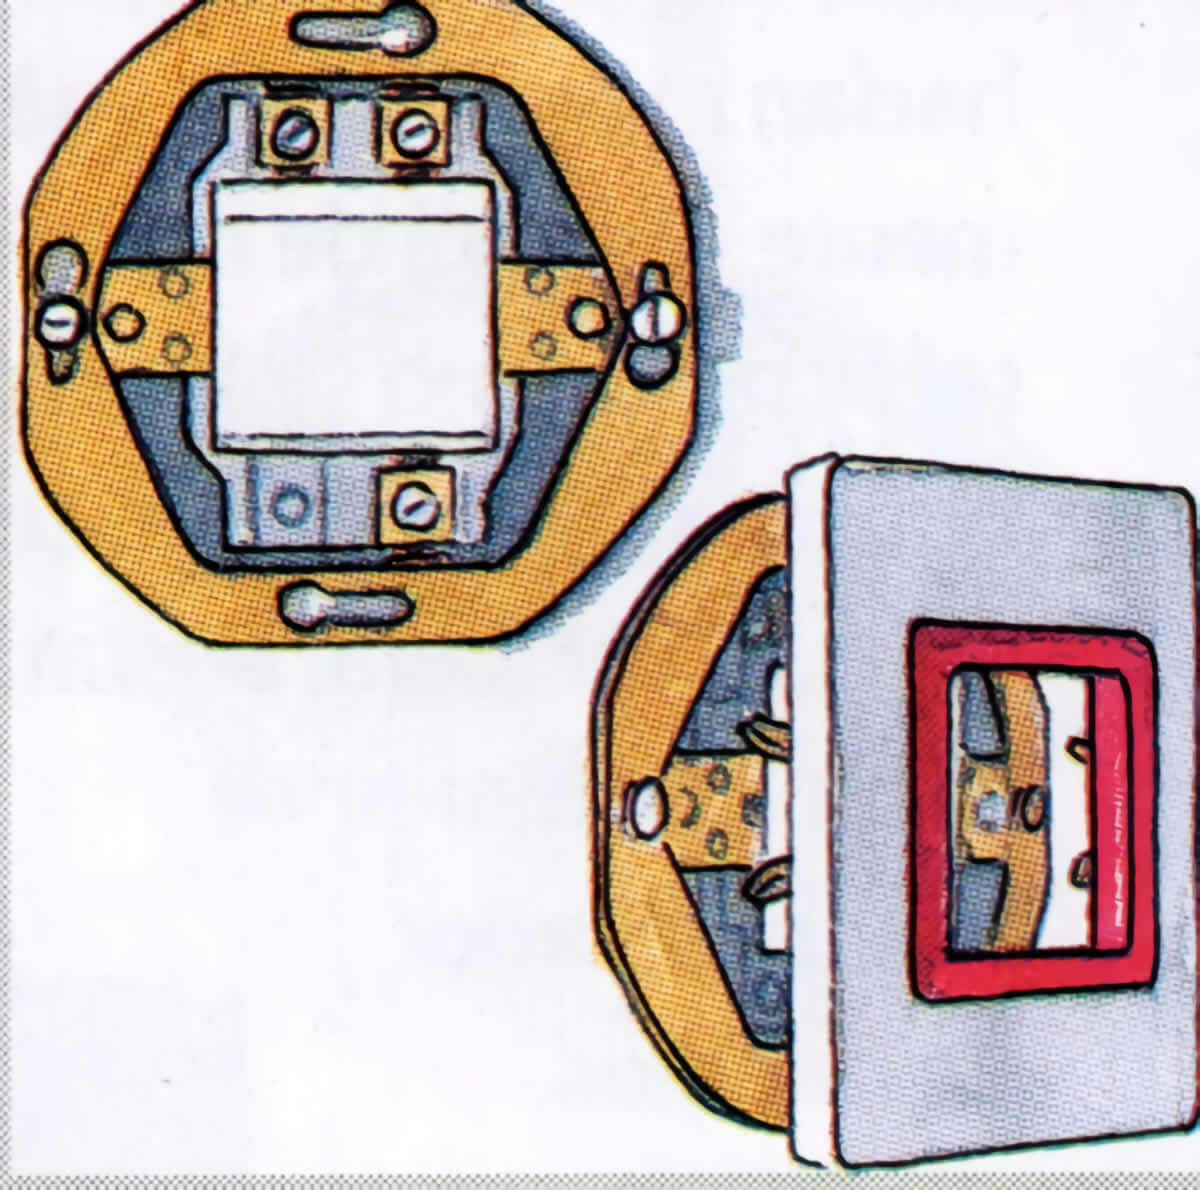 caja-electrica-5